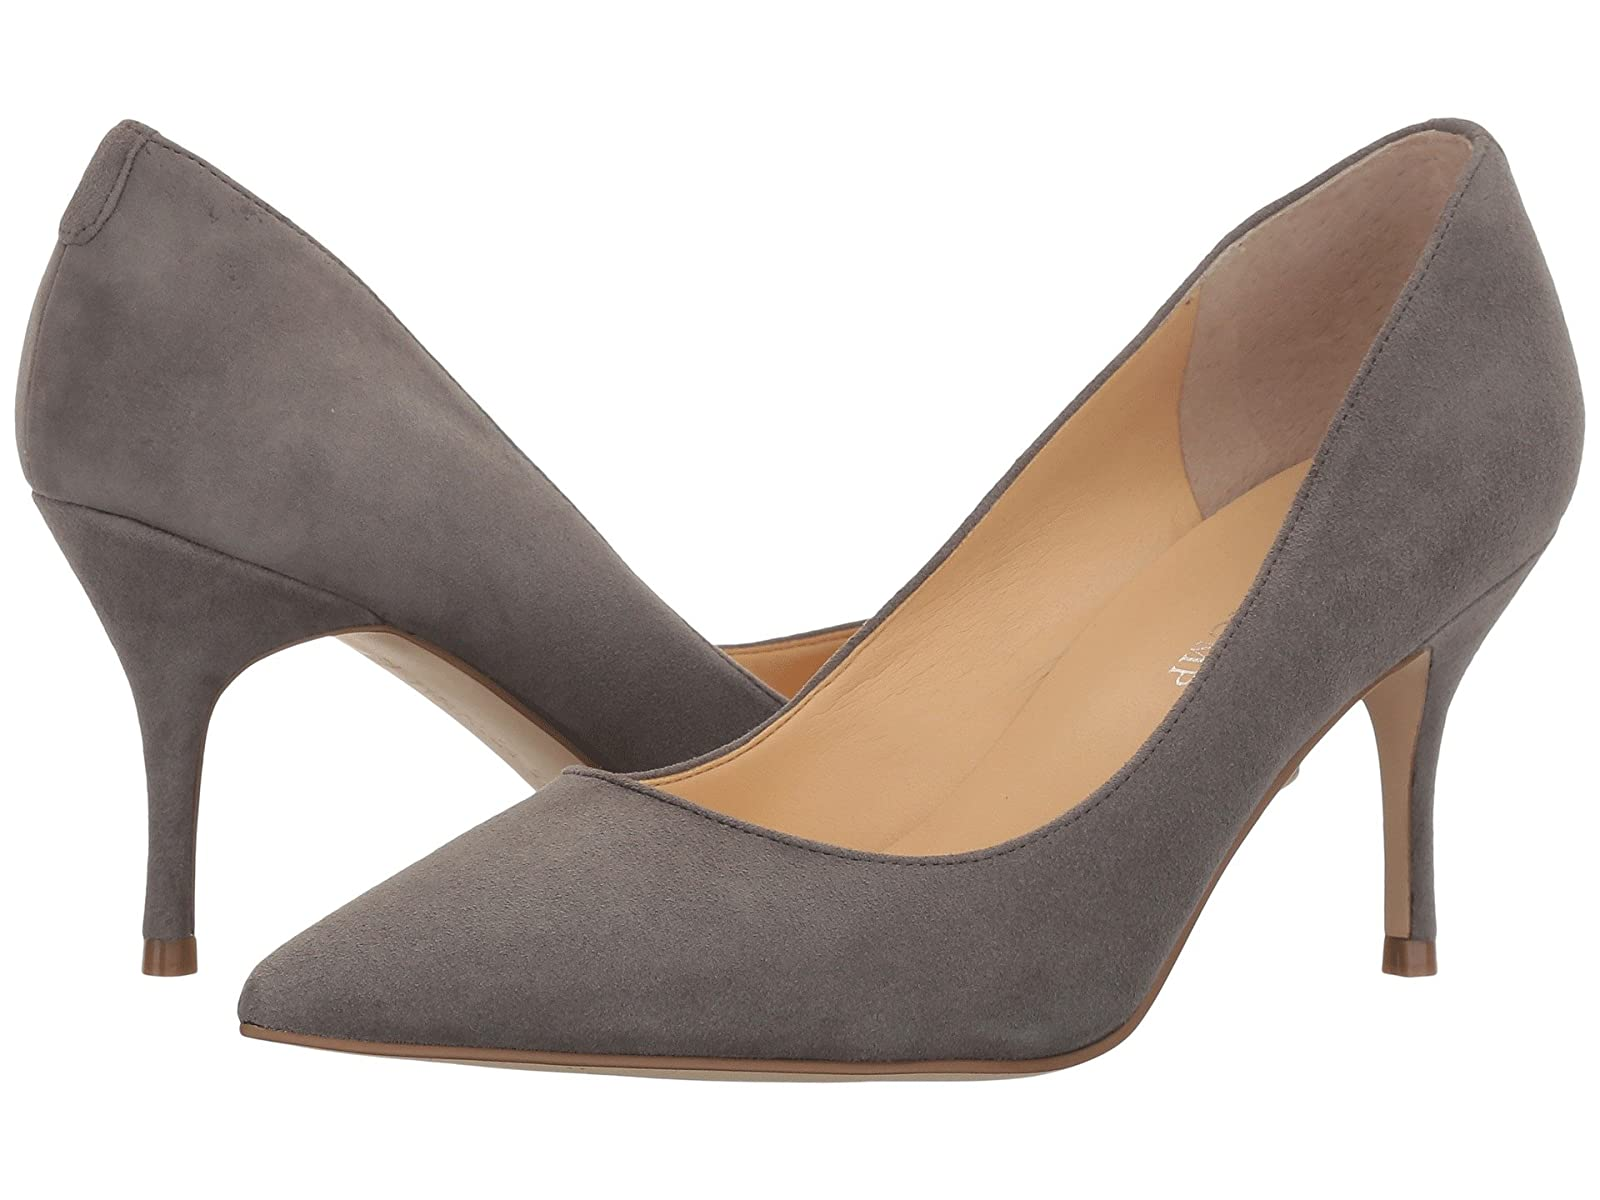 Ivanka Trump Boni 7Cheap and distinctive eye-catching shoes